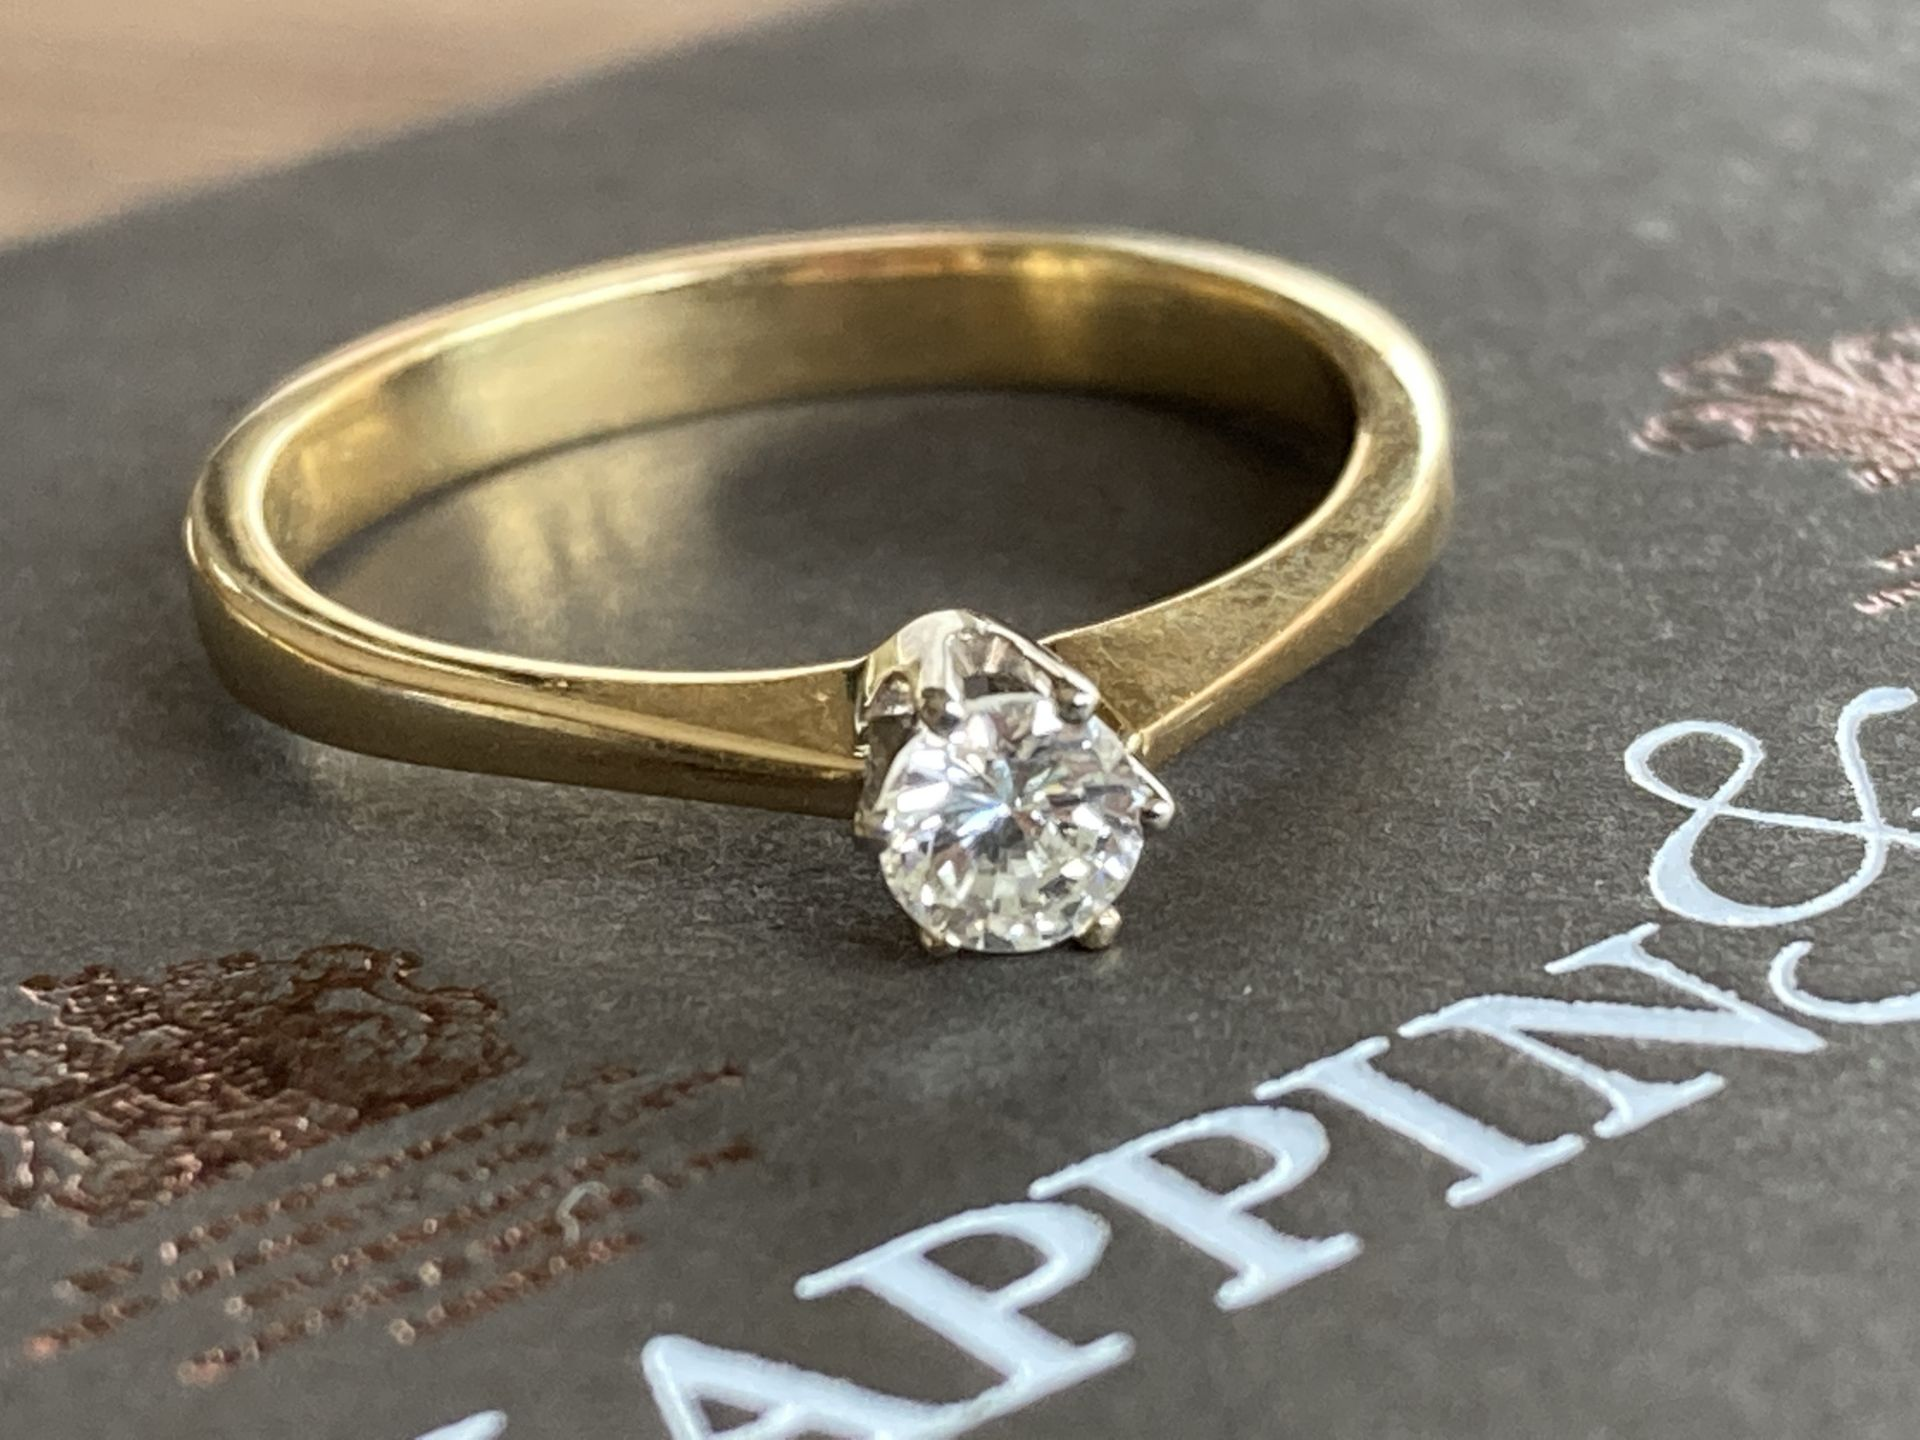 18K GOLD 0.2CT DIAMOND RING